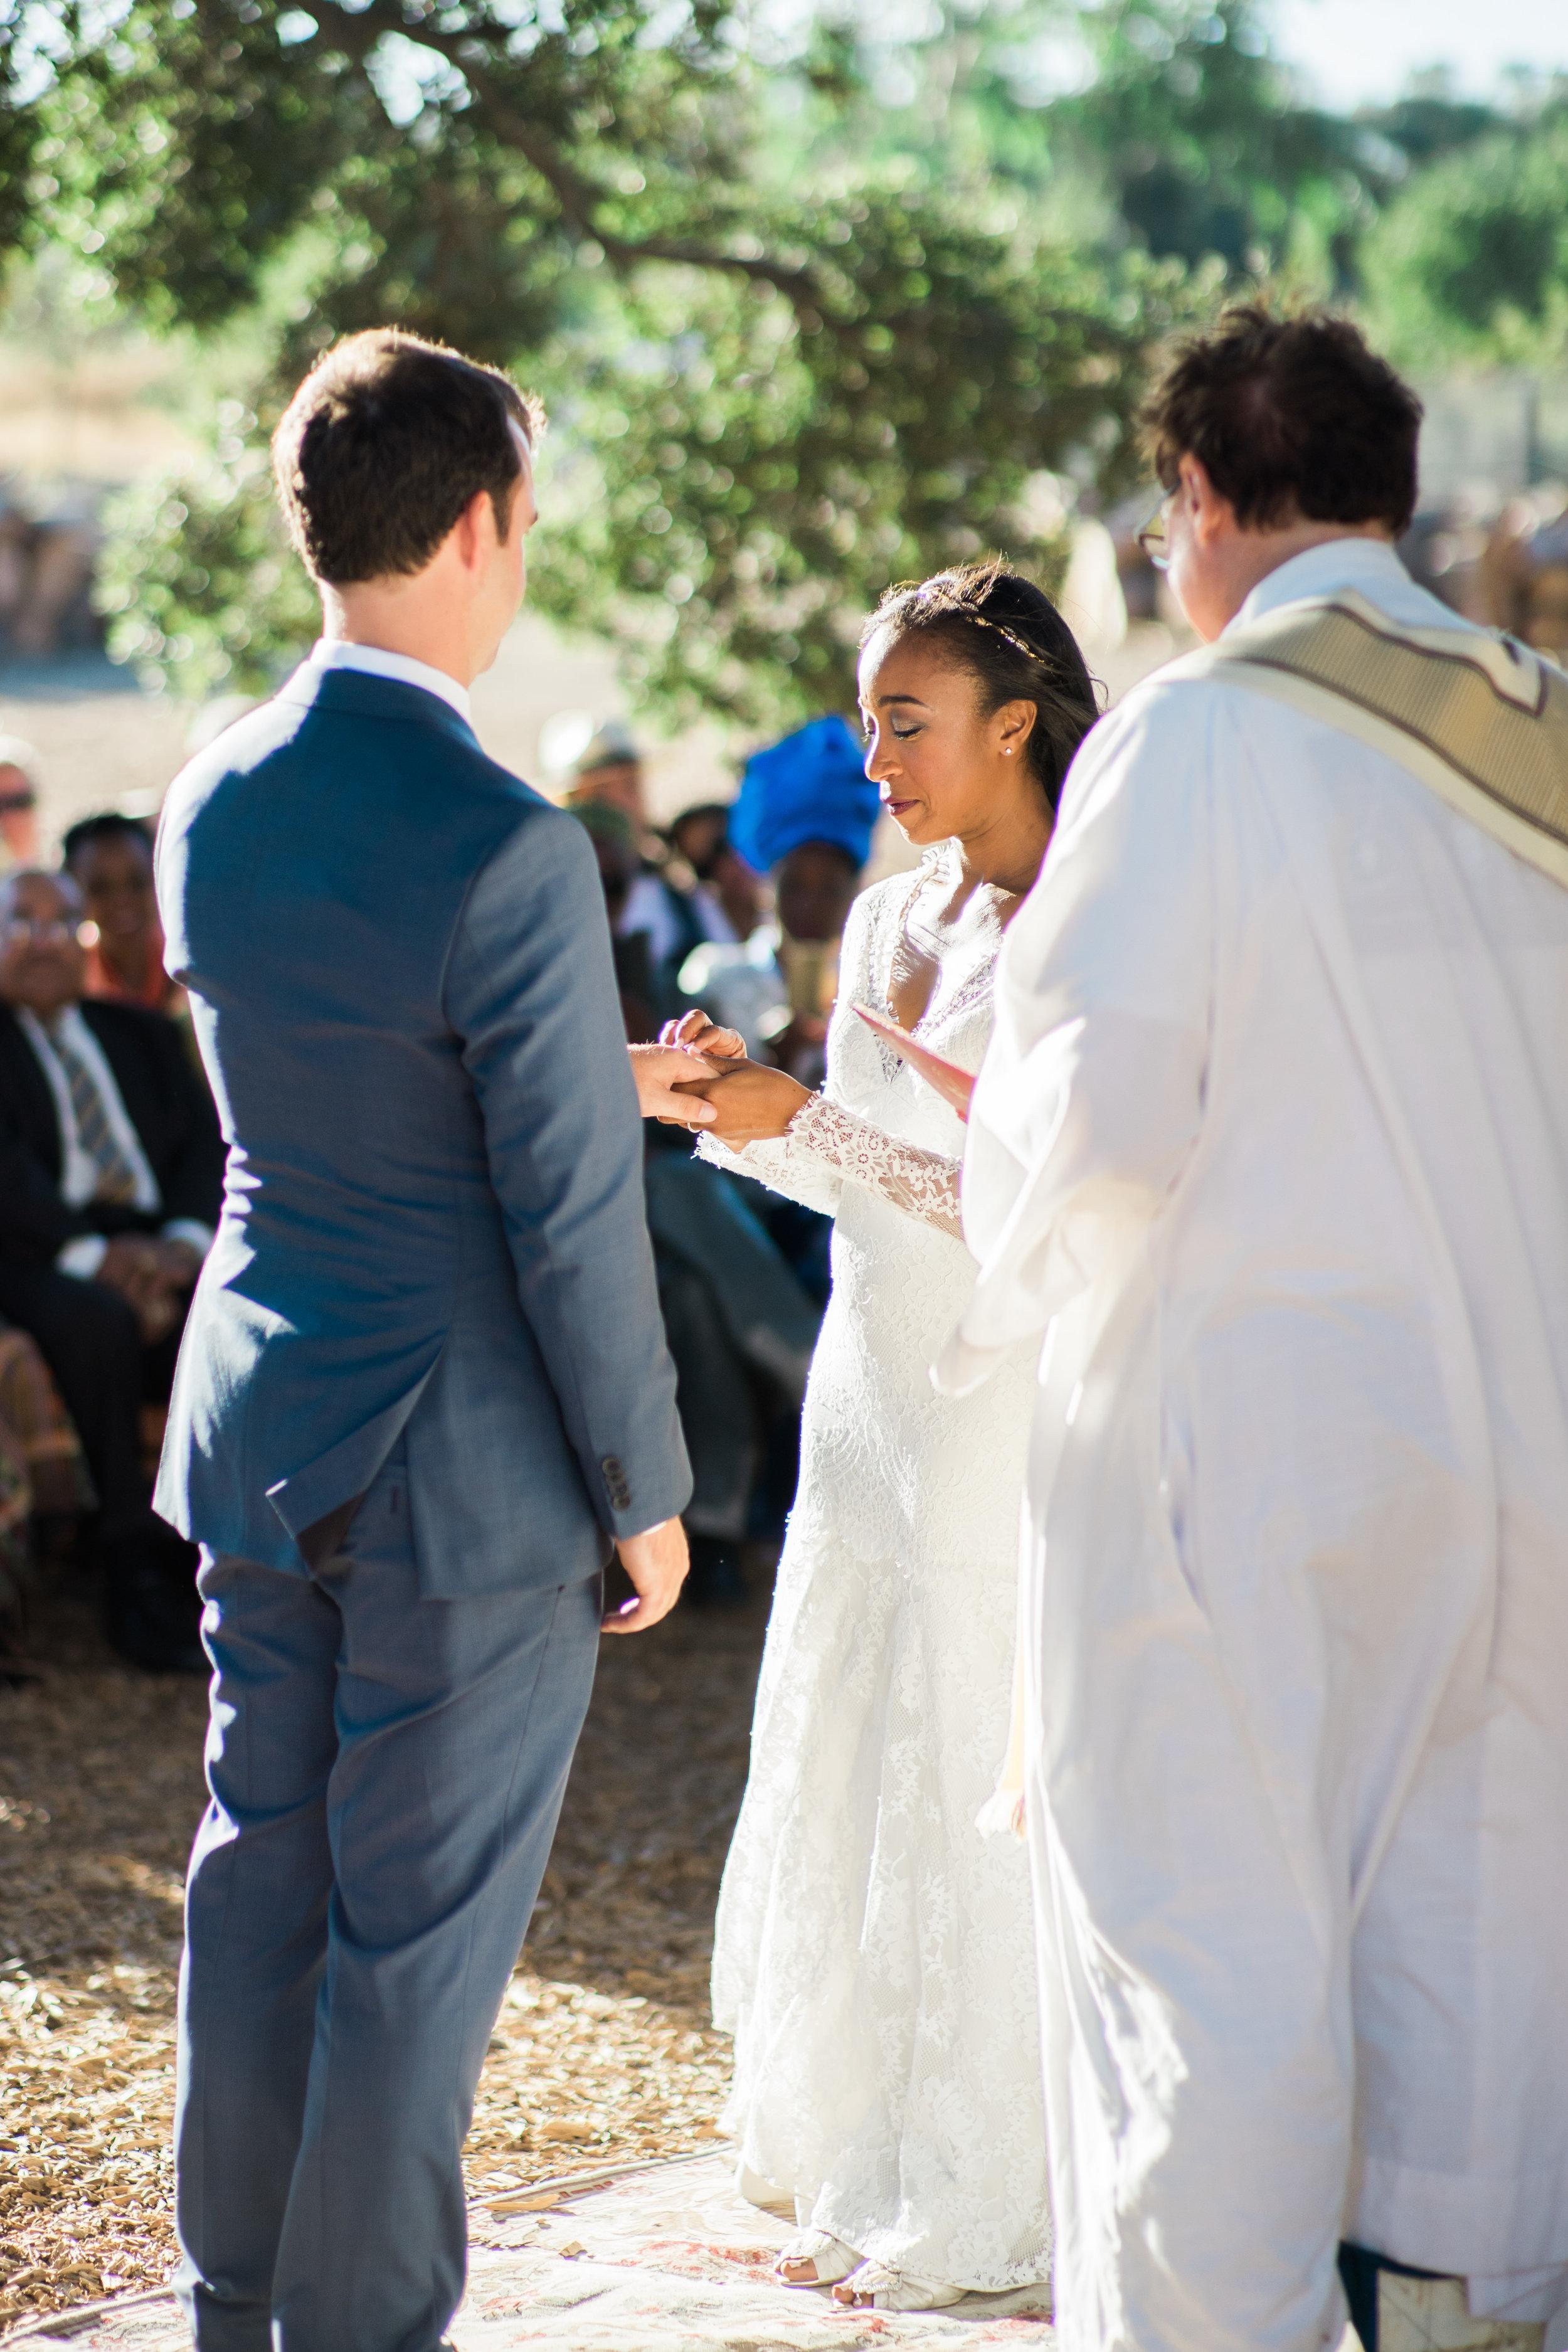 Jenny Quicksall Photography_www.jennyquicksall.com_California Wedding Photographer_Highland Springs Ranch and Inn Resort_Cherry Valley California (46).JPG